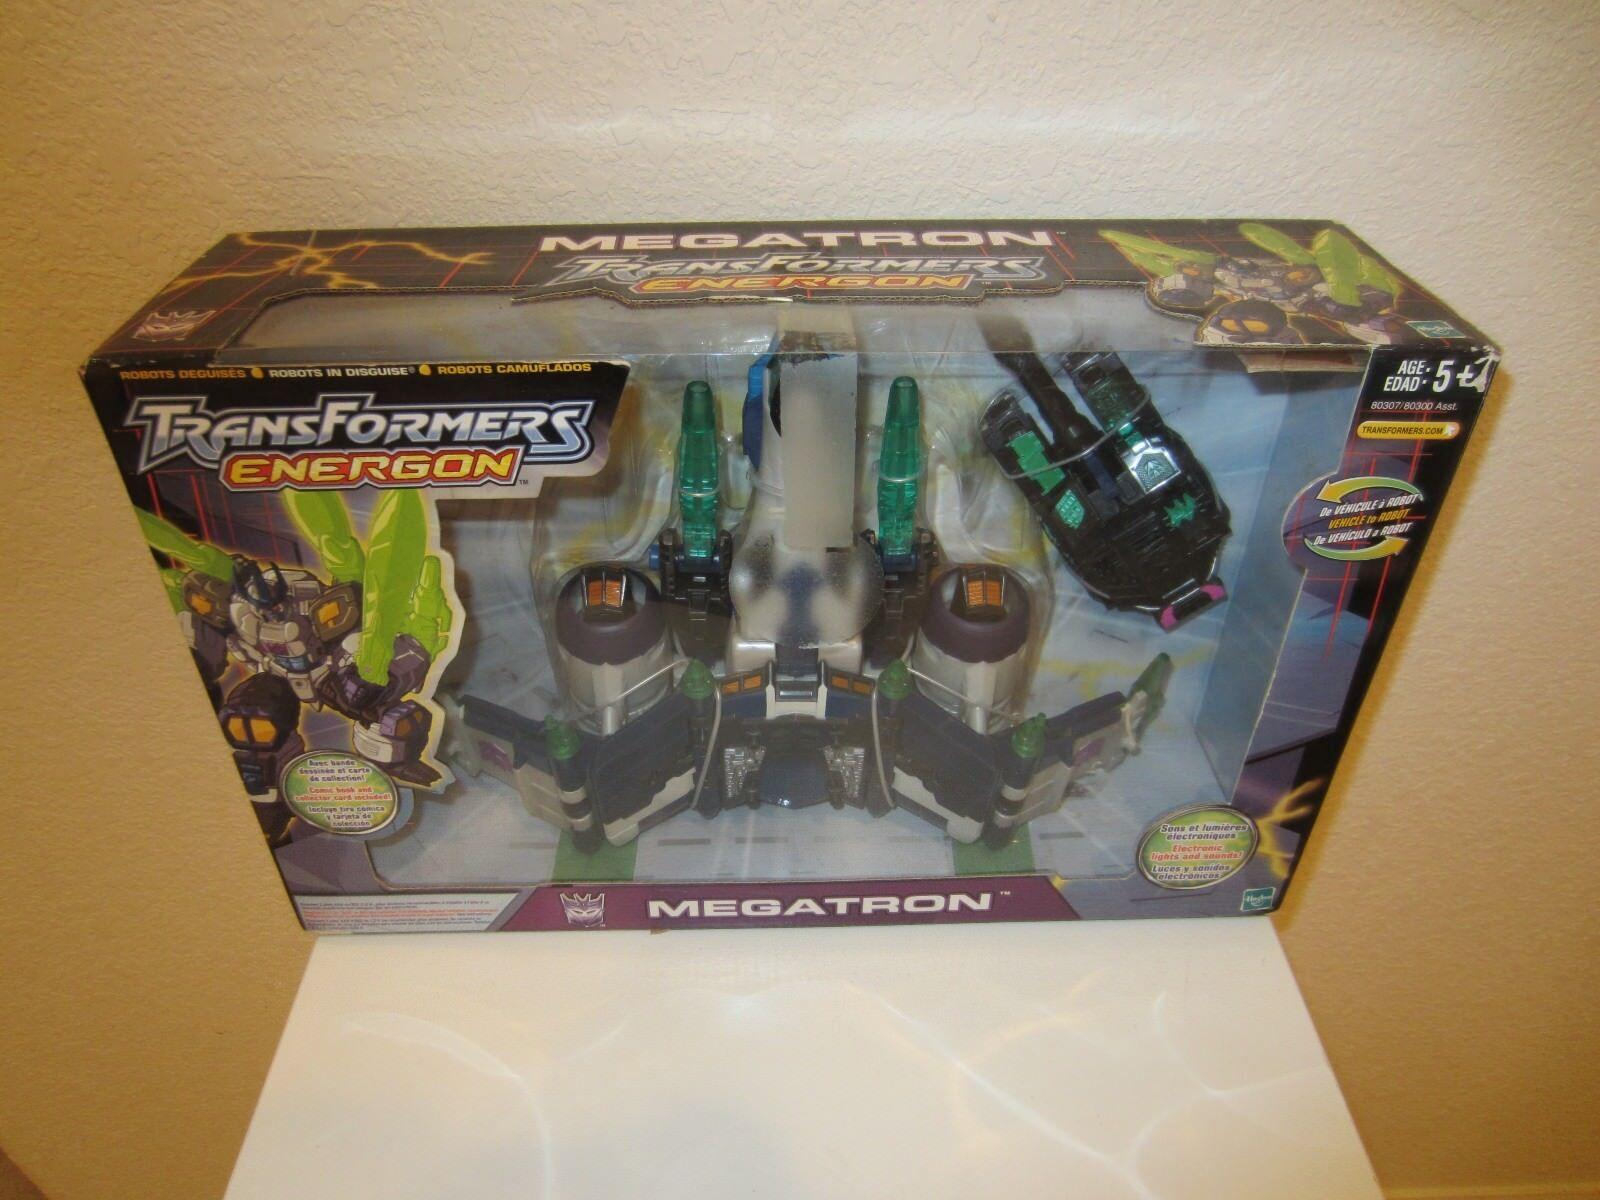 Transformers Action Figure Leader Class Energon Megatron 2003 MISB NEW